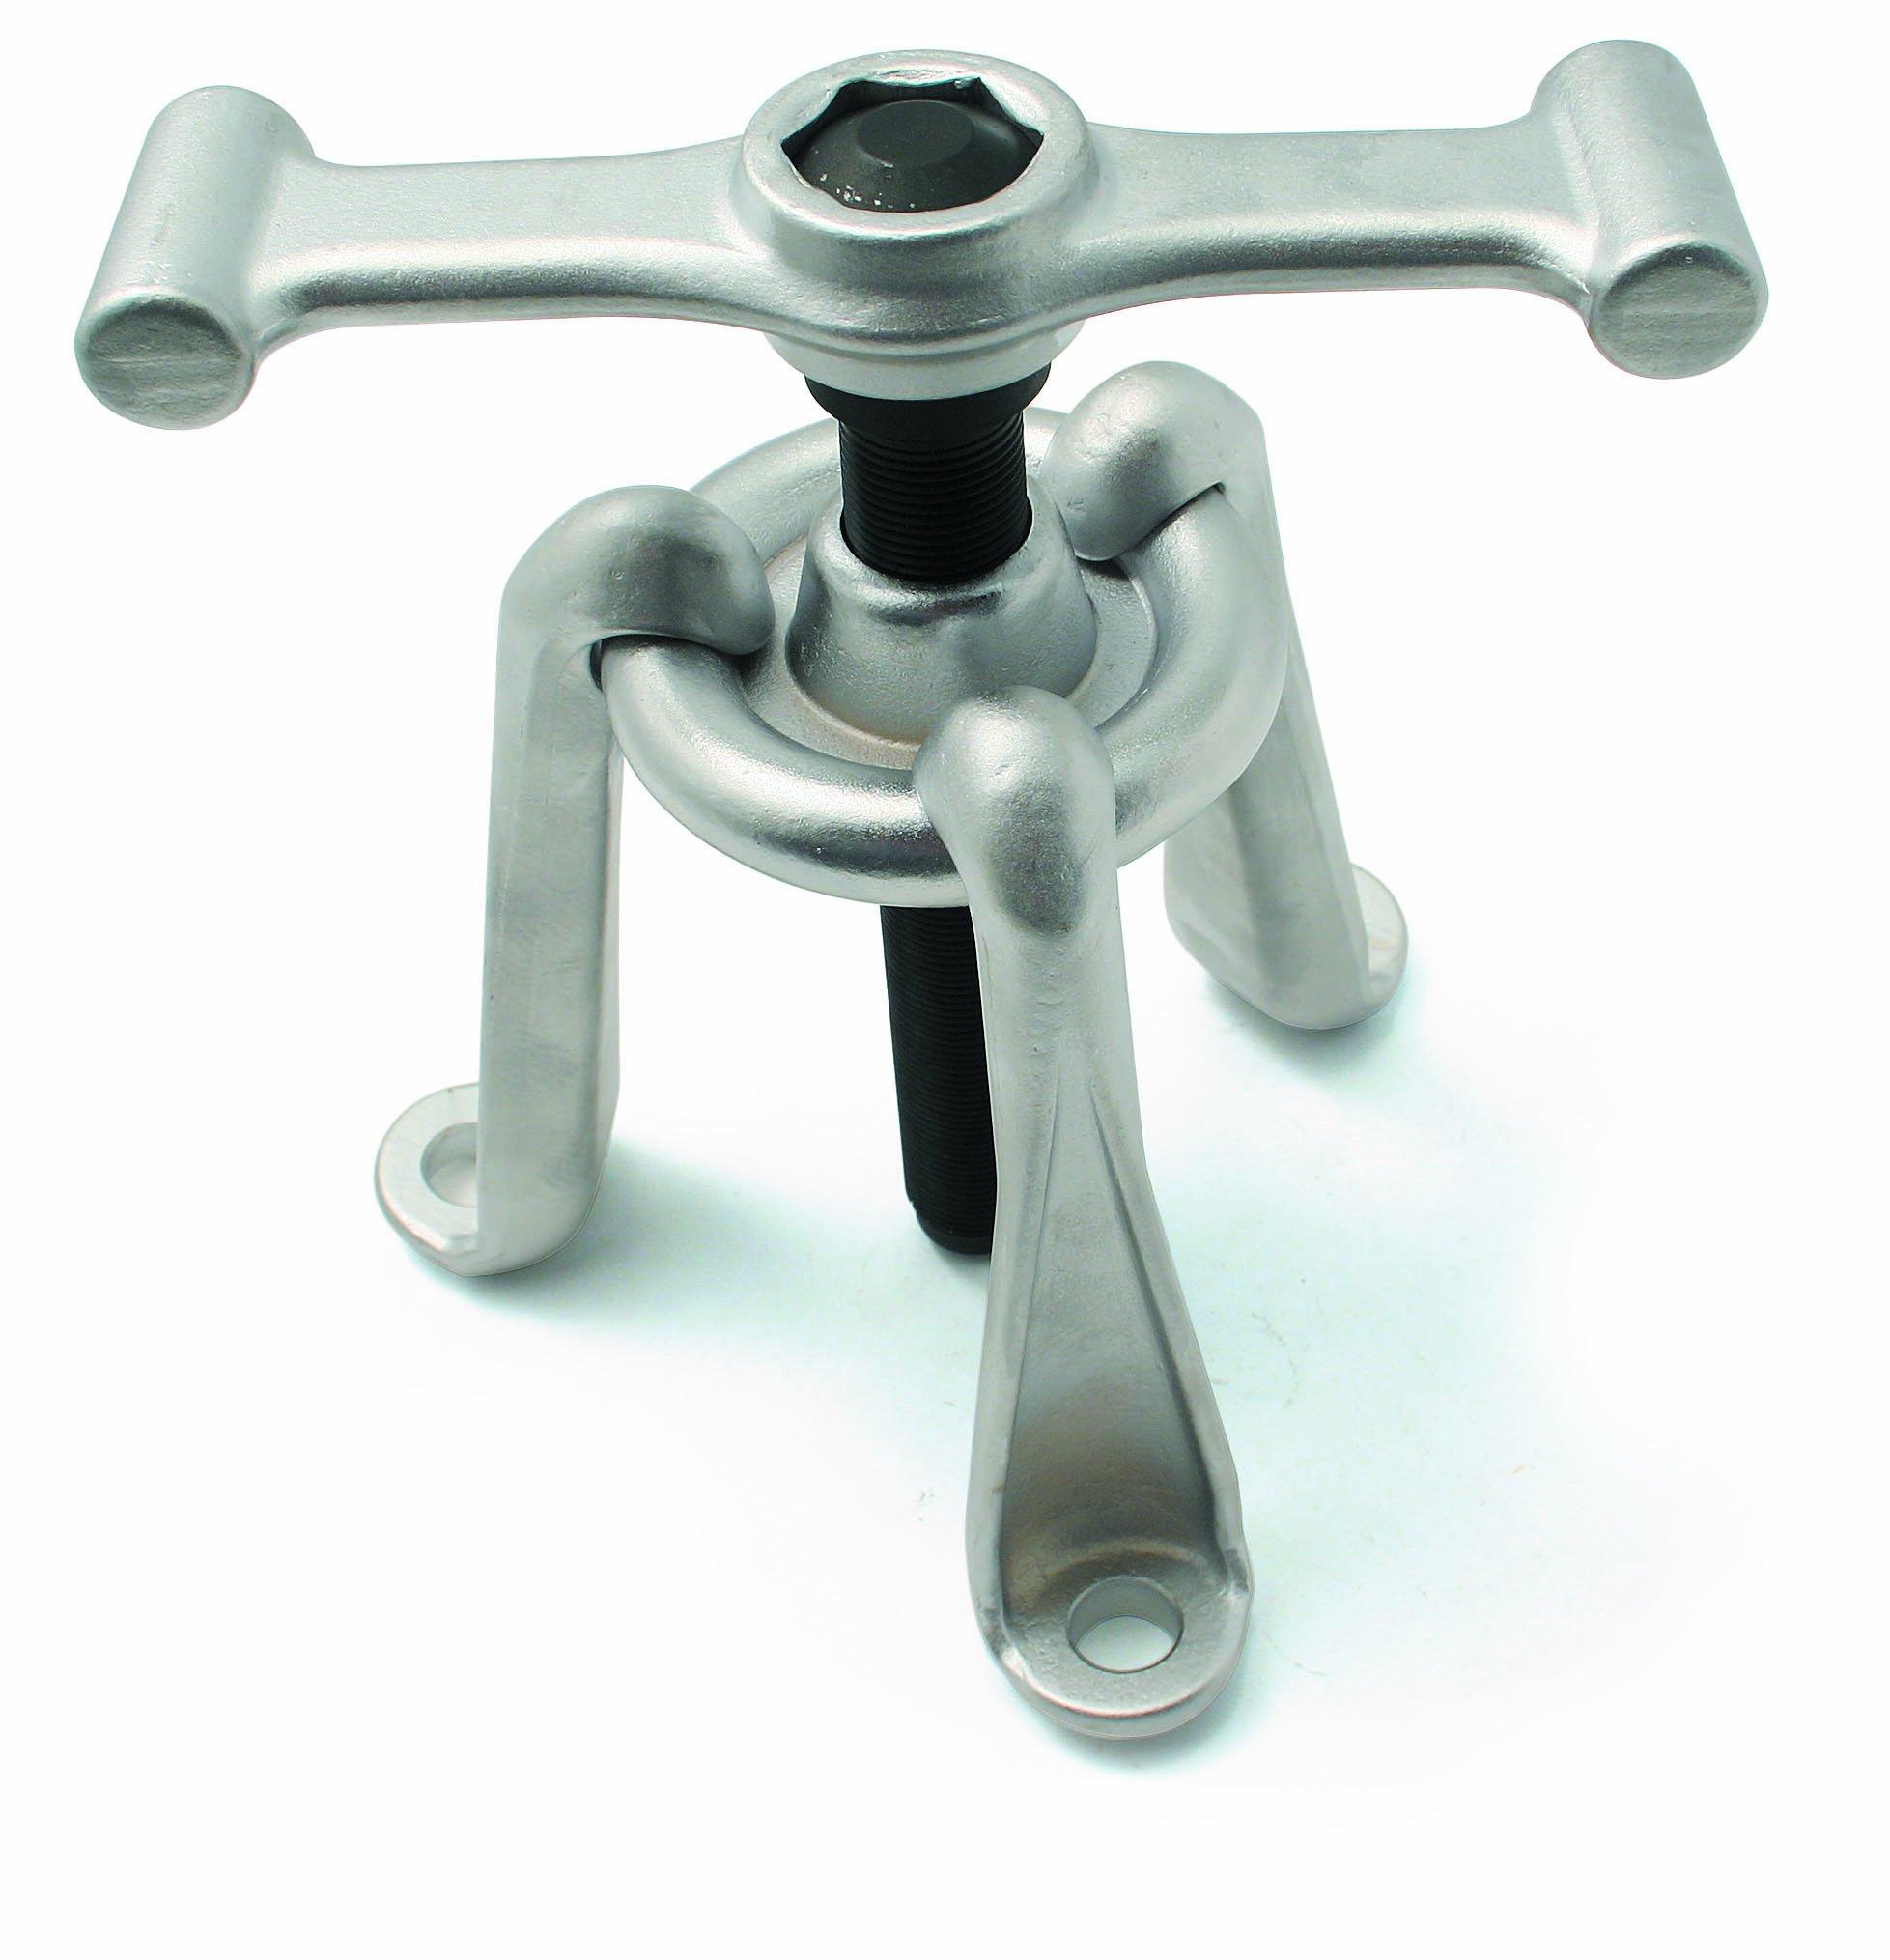 CTA Tools 4320 Universal Hub Puller Tool